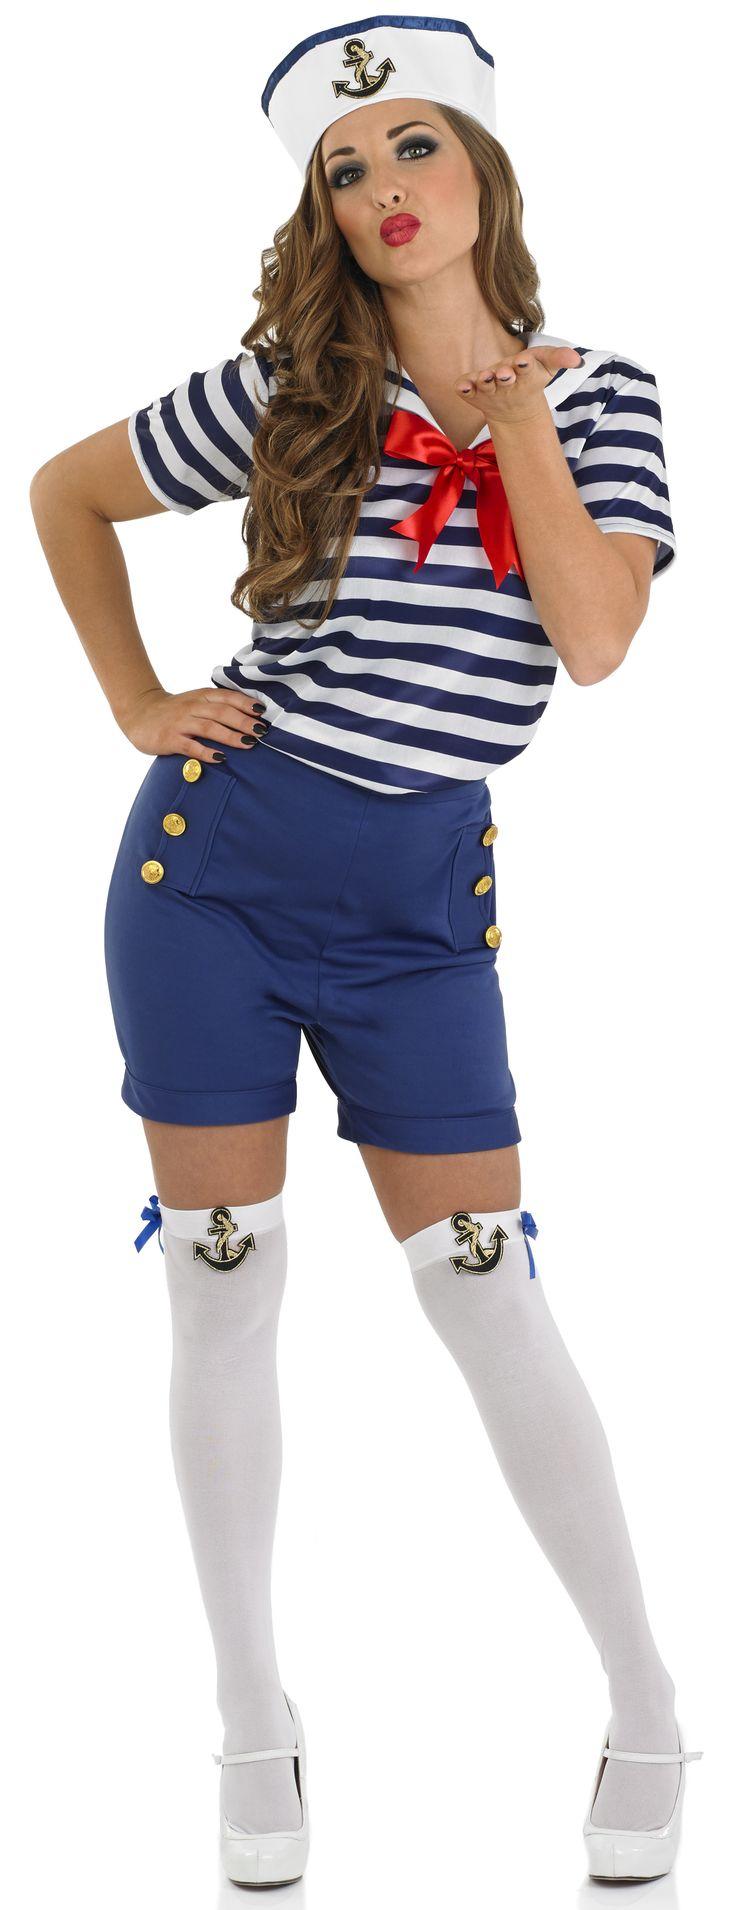 http://www.ebay.com.sg/itm/Sexy-Sailor-Hat-Ladies-Fancy-Dress-Military-Uniform-Womens-Adult-Navy-Costume-/360992019054 3685S.jpg (1584×4112)